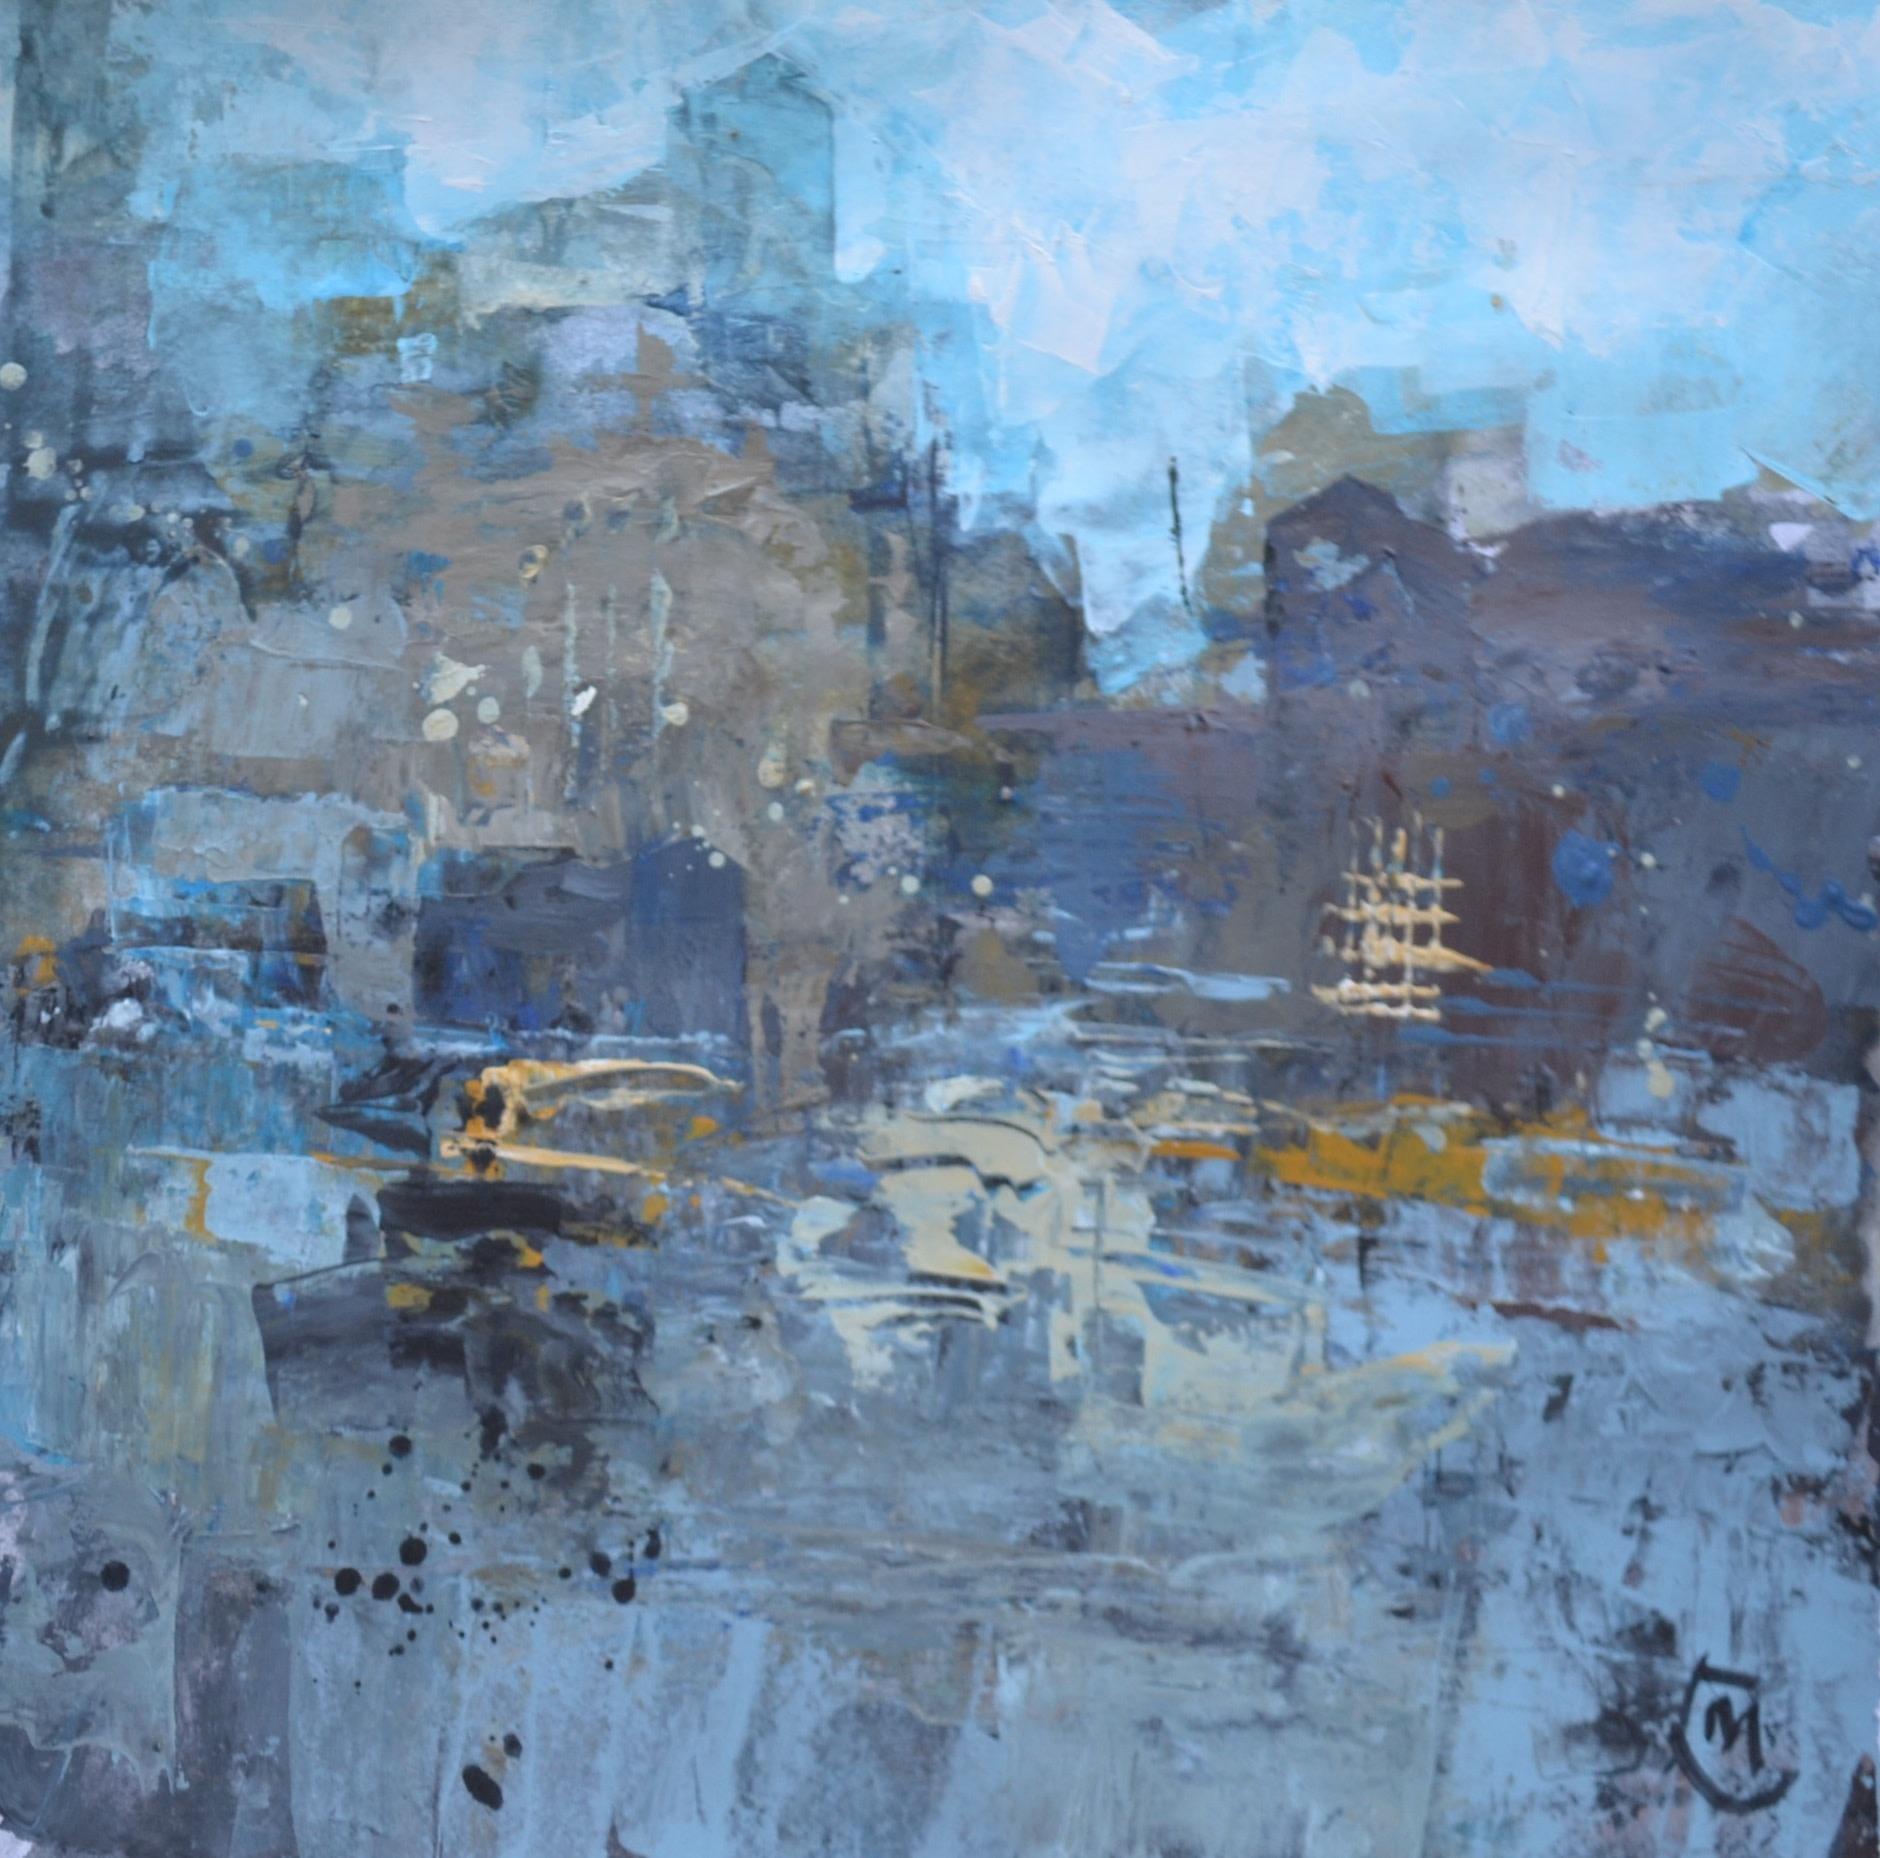 <span class=&#34;link fancybox-details-link&#34;><a href=&#34;/exhibitions/24/works/artworks_standalone10742/&#34;>View Detail Page</a></span><div class=&#34;artist&#34;><span class=&#34;artist&#34;><strong>Colin Merrin</strong></span></div><div class=&#34;title&#34;><em>Composition 208</em></div><div class=&#34;medium&#34;>acrylic</div><div class=&#34;dimensions&#34;>38x38cm</div>